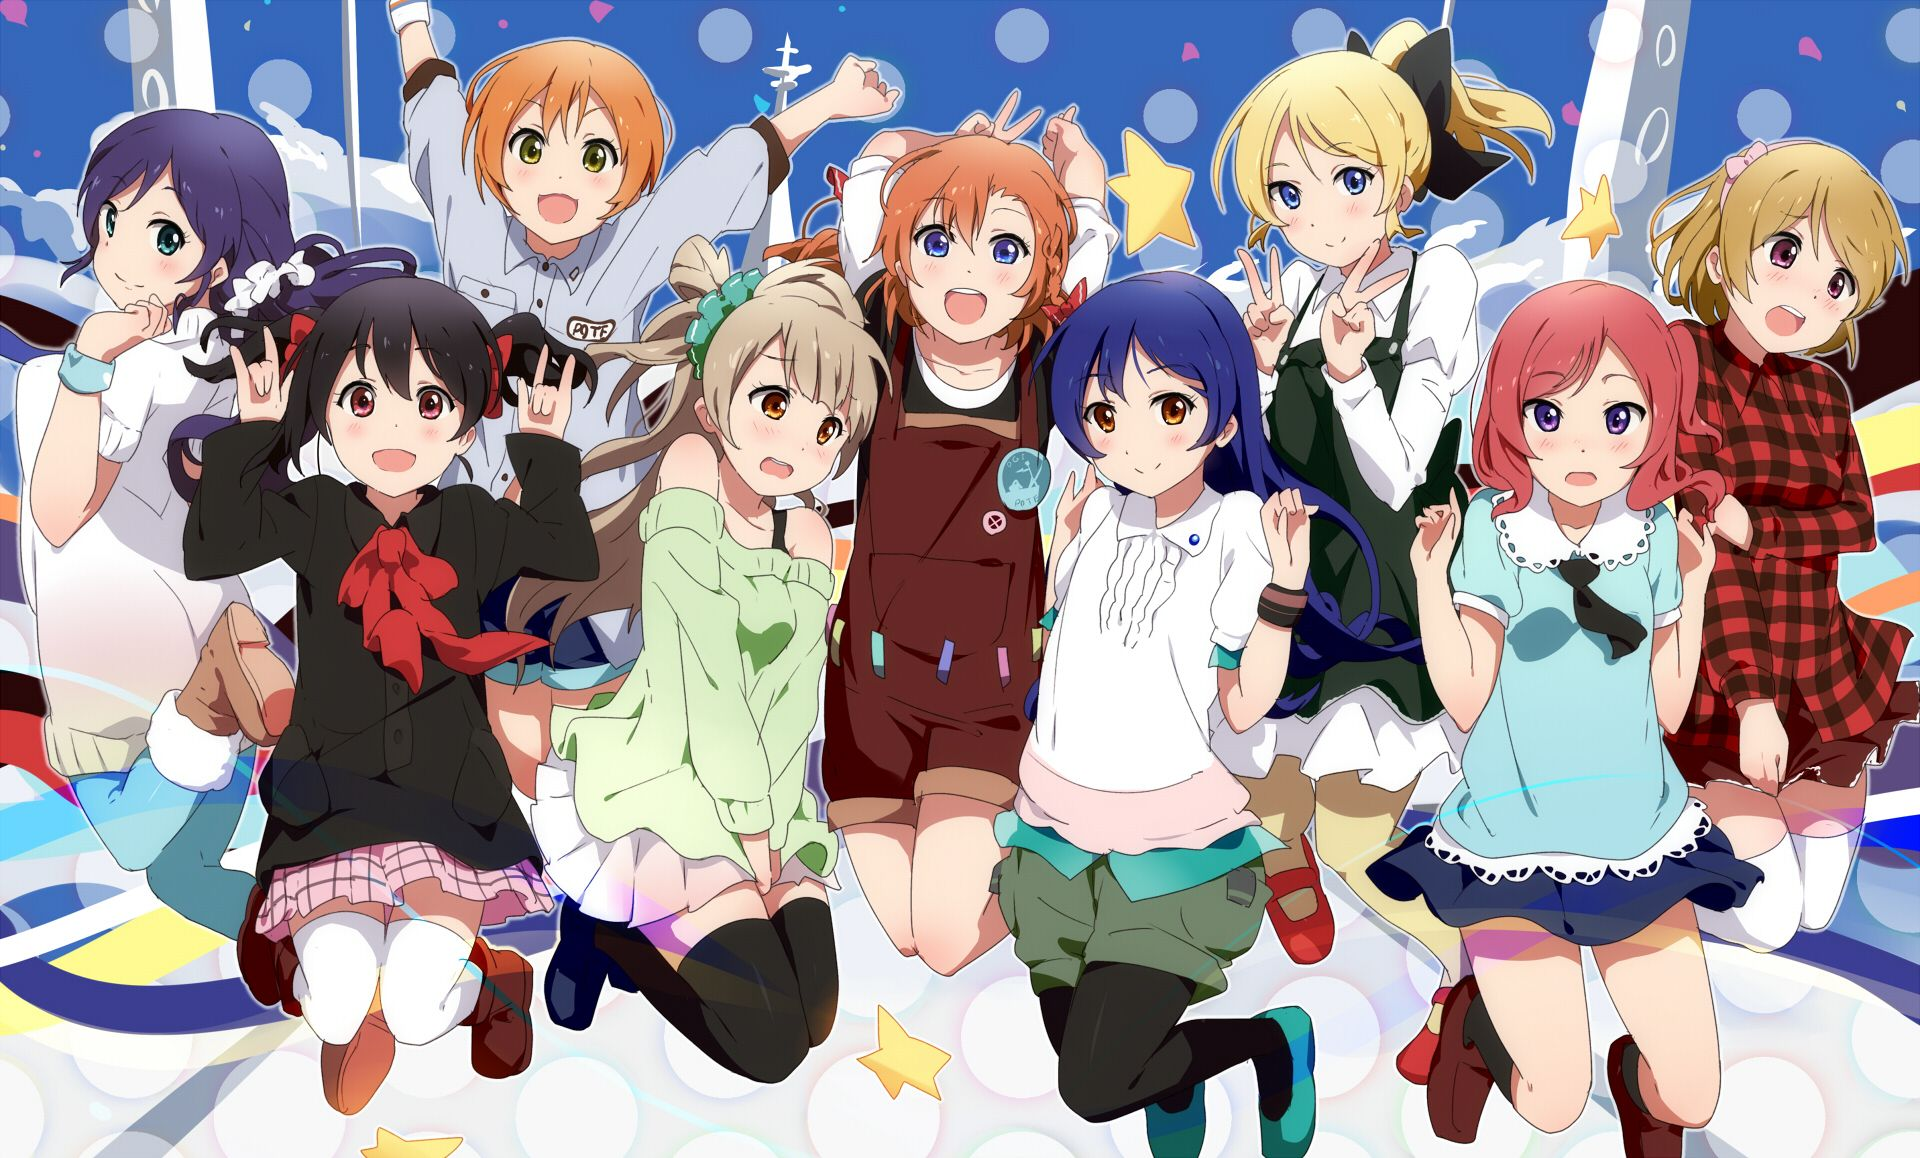 Love Live School Idol Project Wallpaper Wallpapersafari Anime